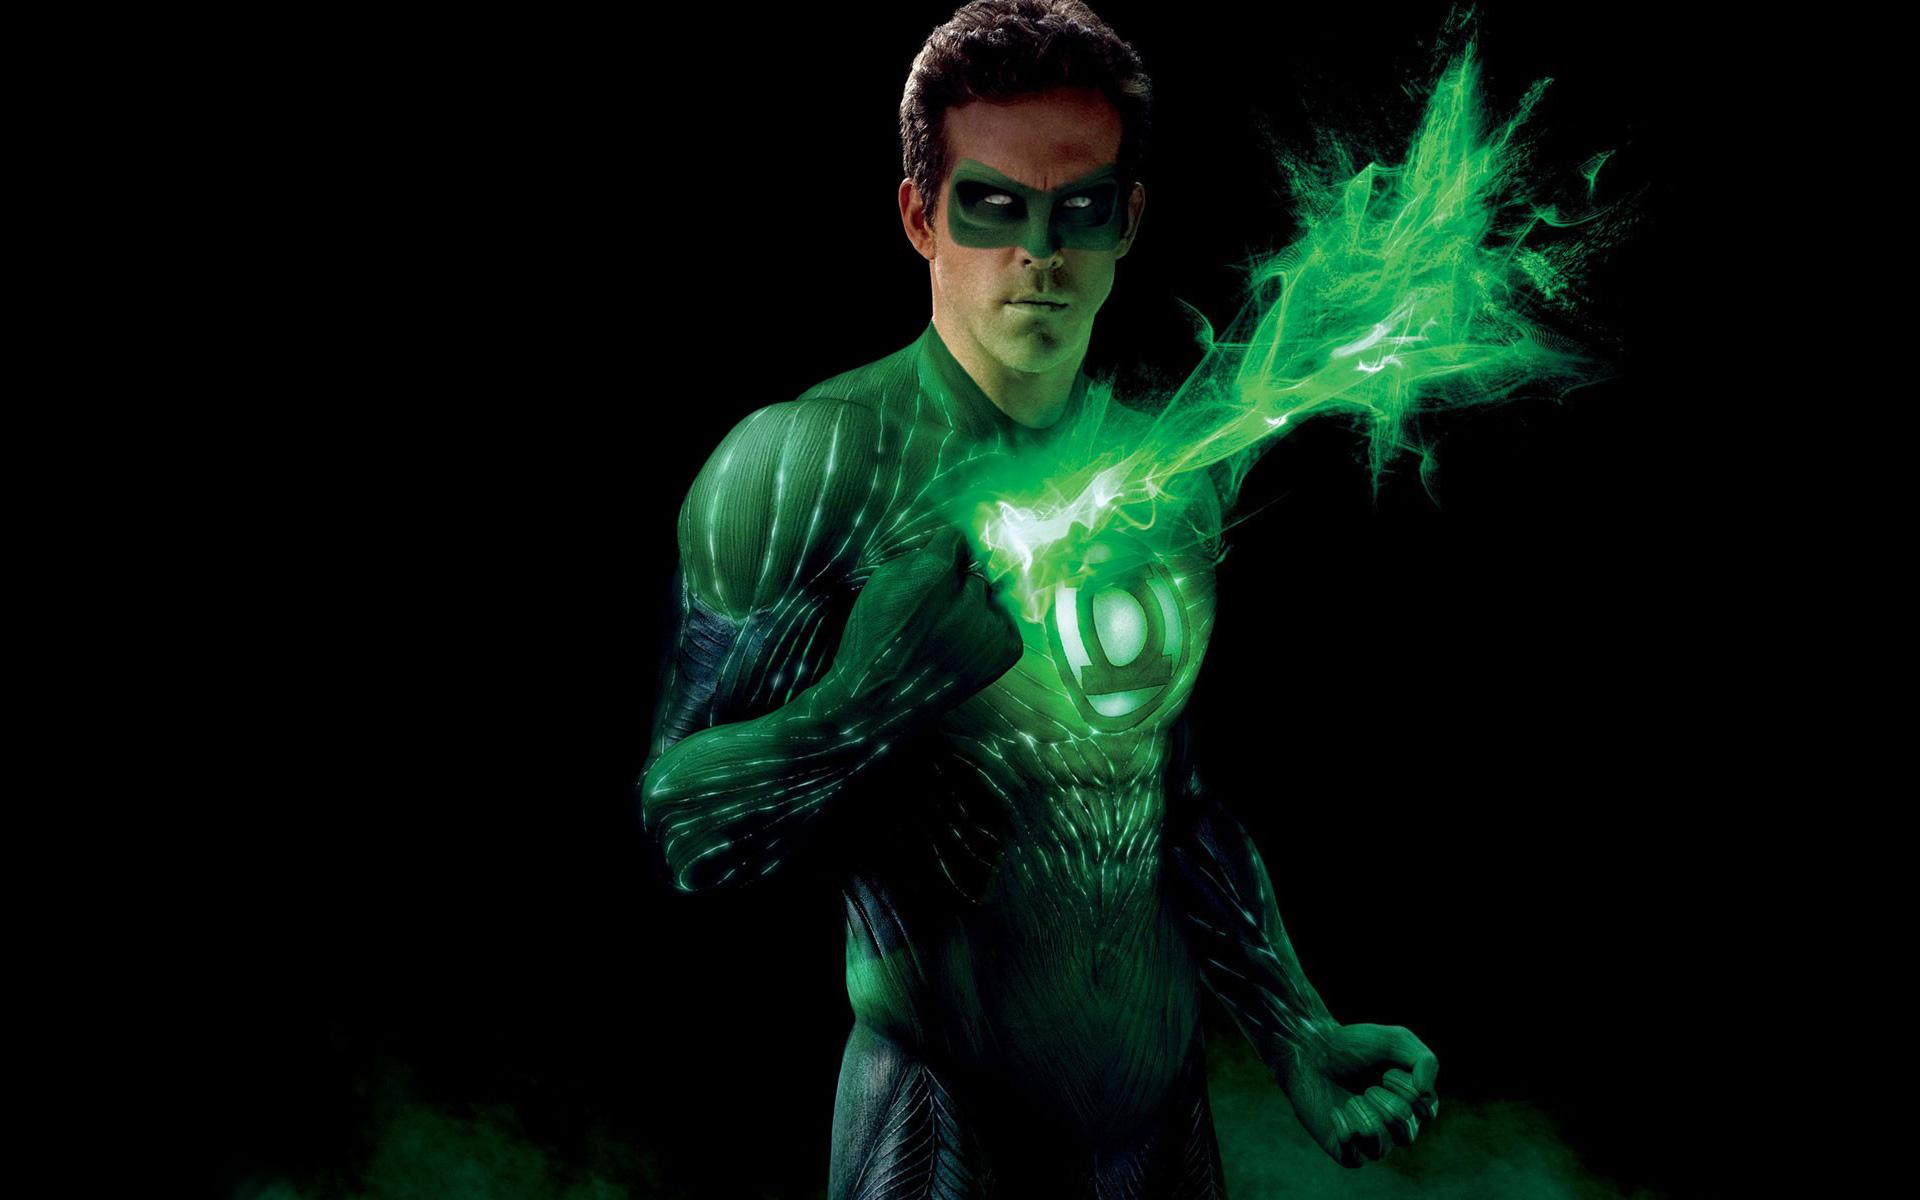 Download Green Lantern Wallpapers [1920x1200] 74 Green Lantern 1920x1200